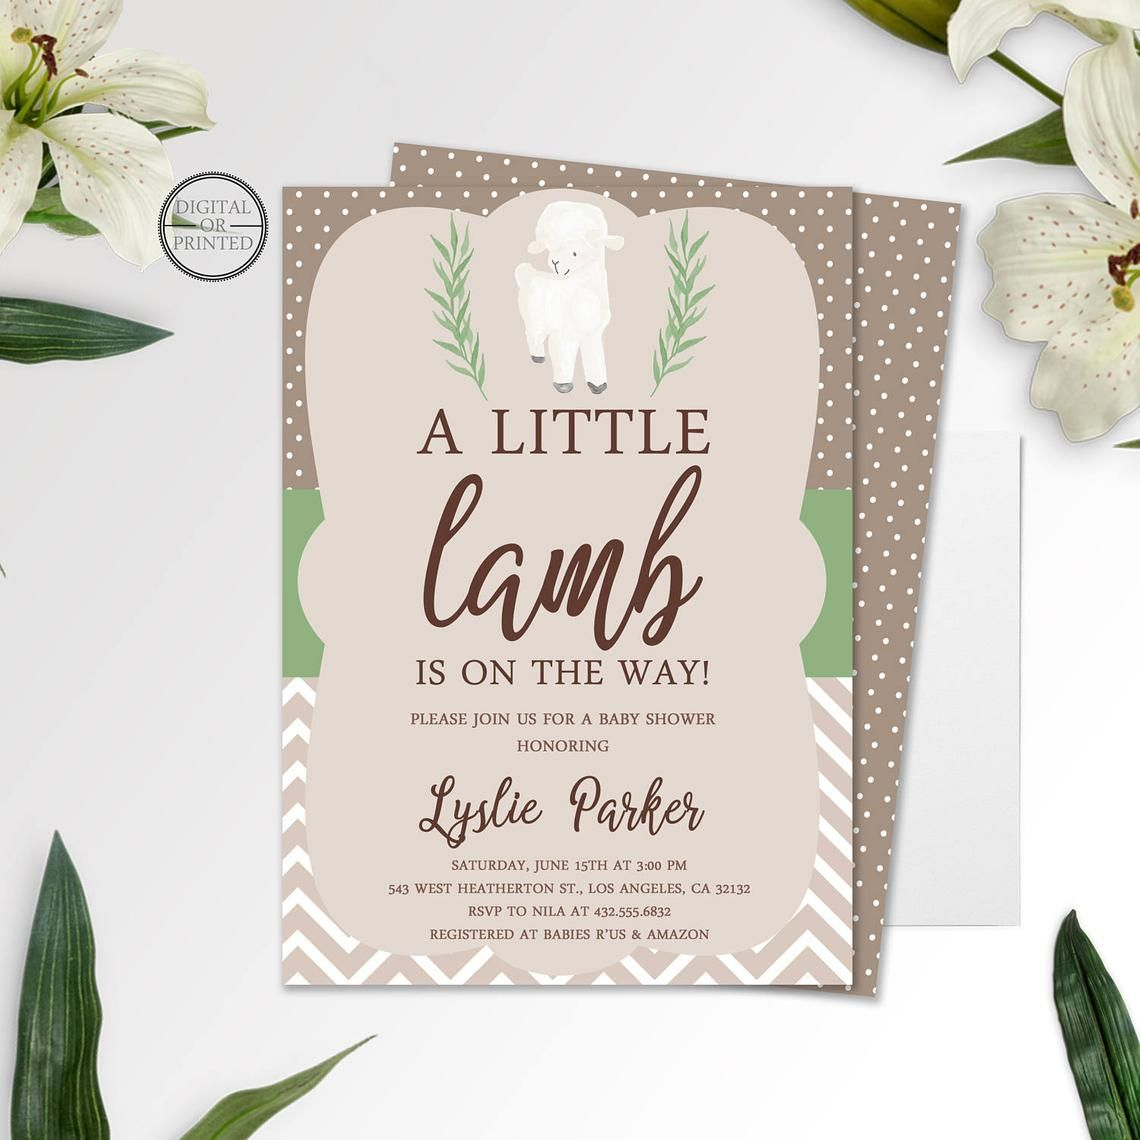 Little Lamb Baby Shower Spring Baby Shower invitation